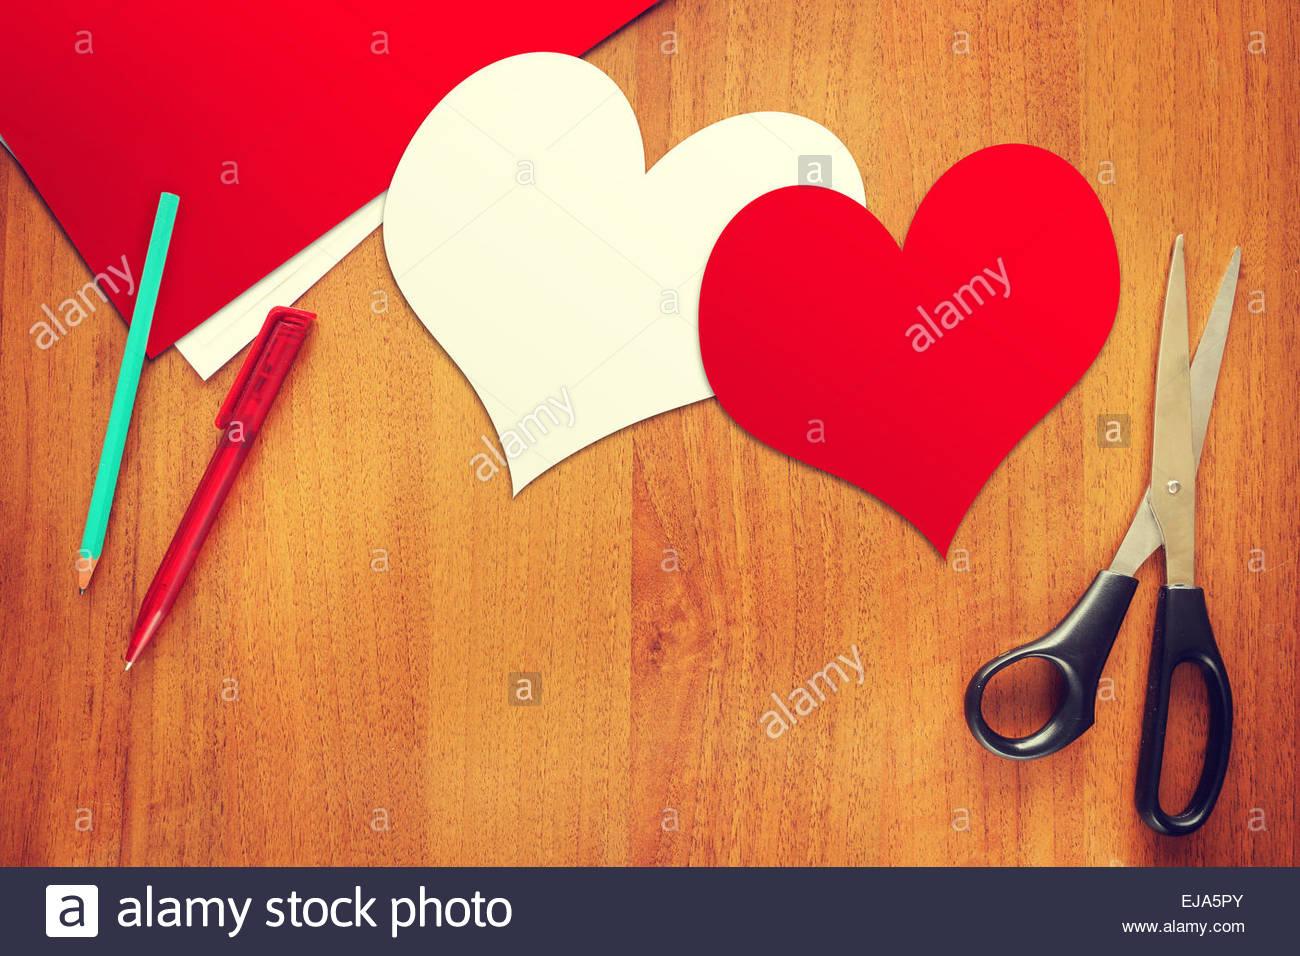 Two paper hearts symbols of love stock photo royalty free image two paper hearts symbols of love biocorpaavc